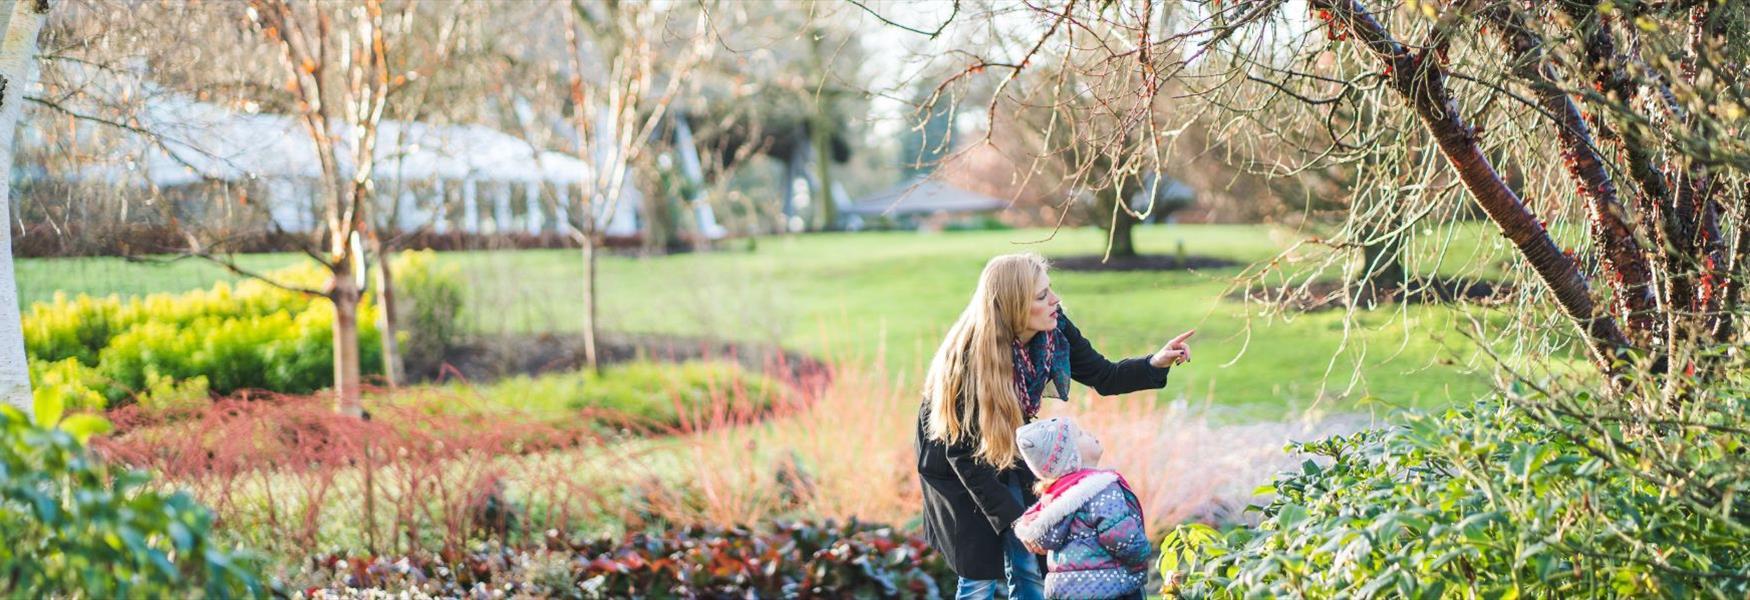 Wintertime in The Savill Garden